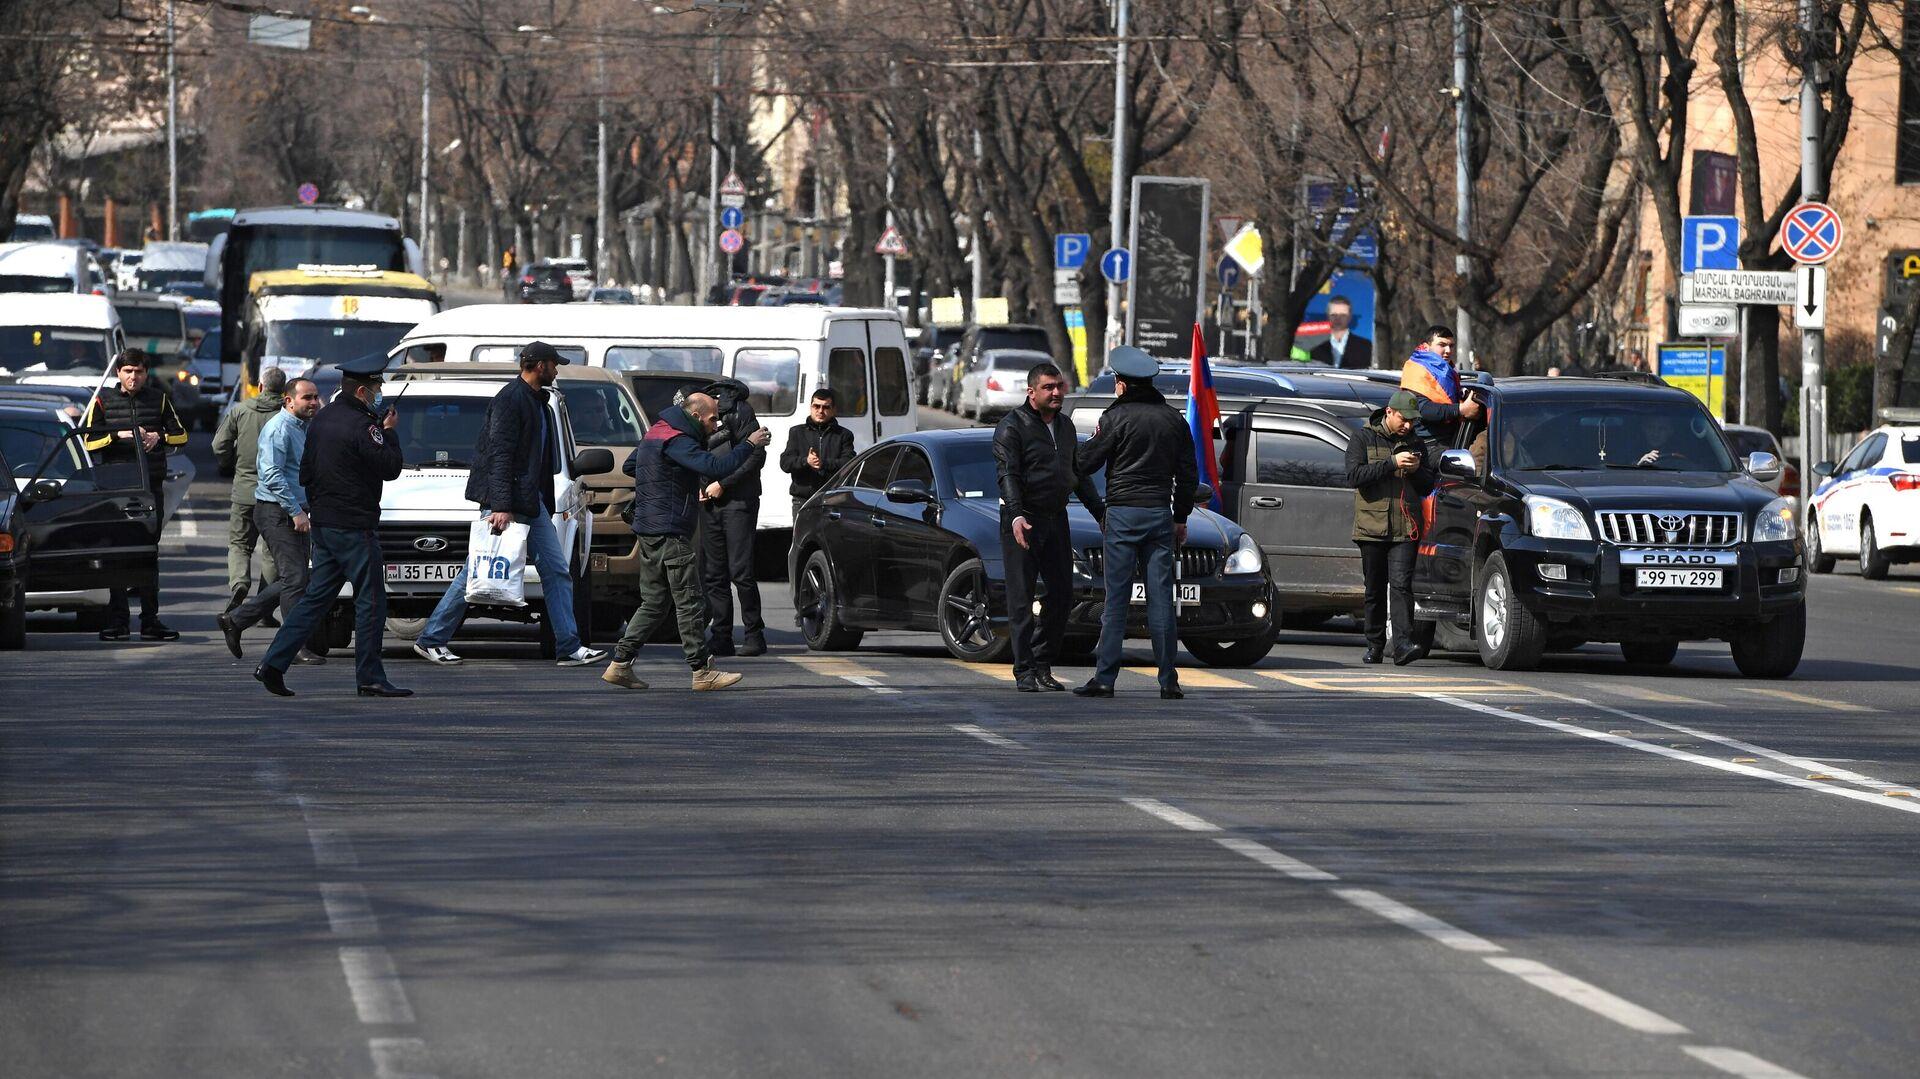 Протестующие перекрыли проспект Баграмяна в Ереване - РИА Новости, 1920, 25.02.2021